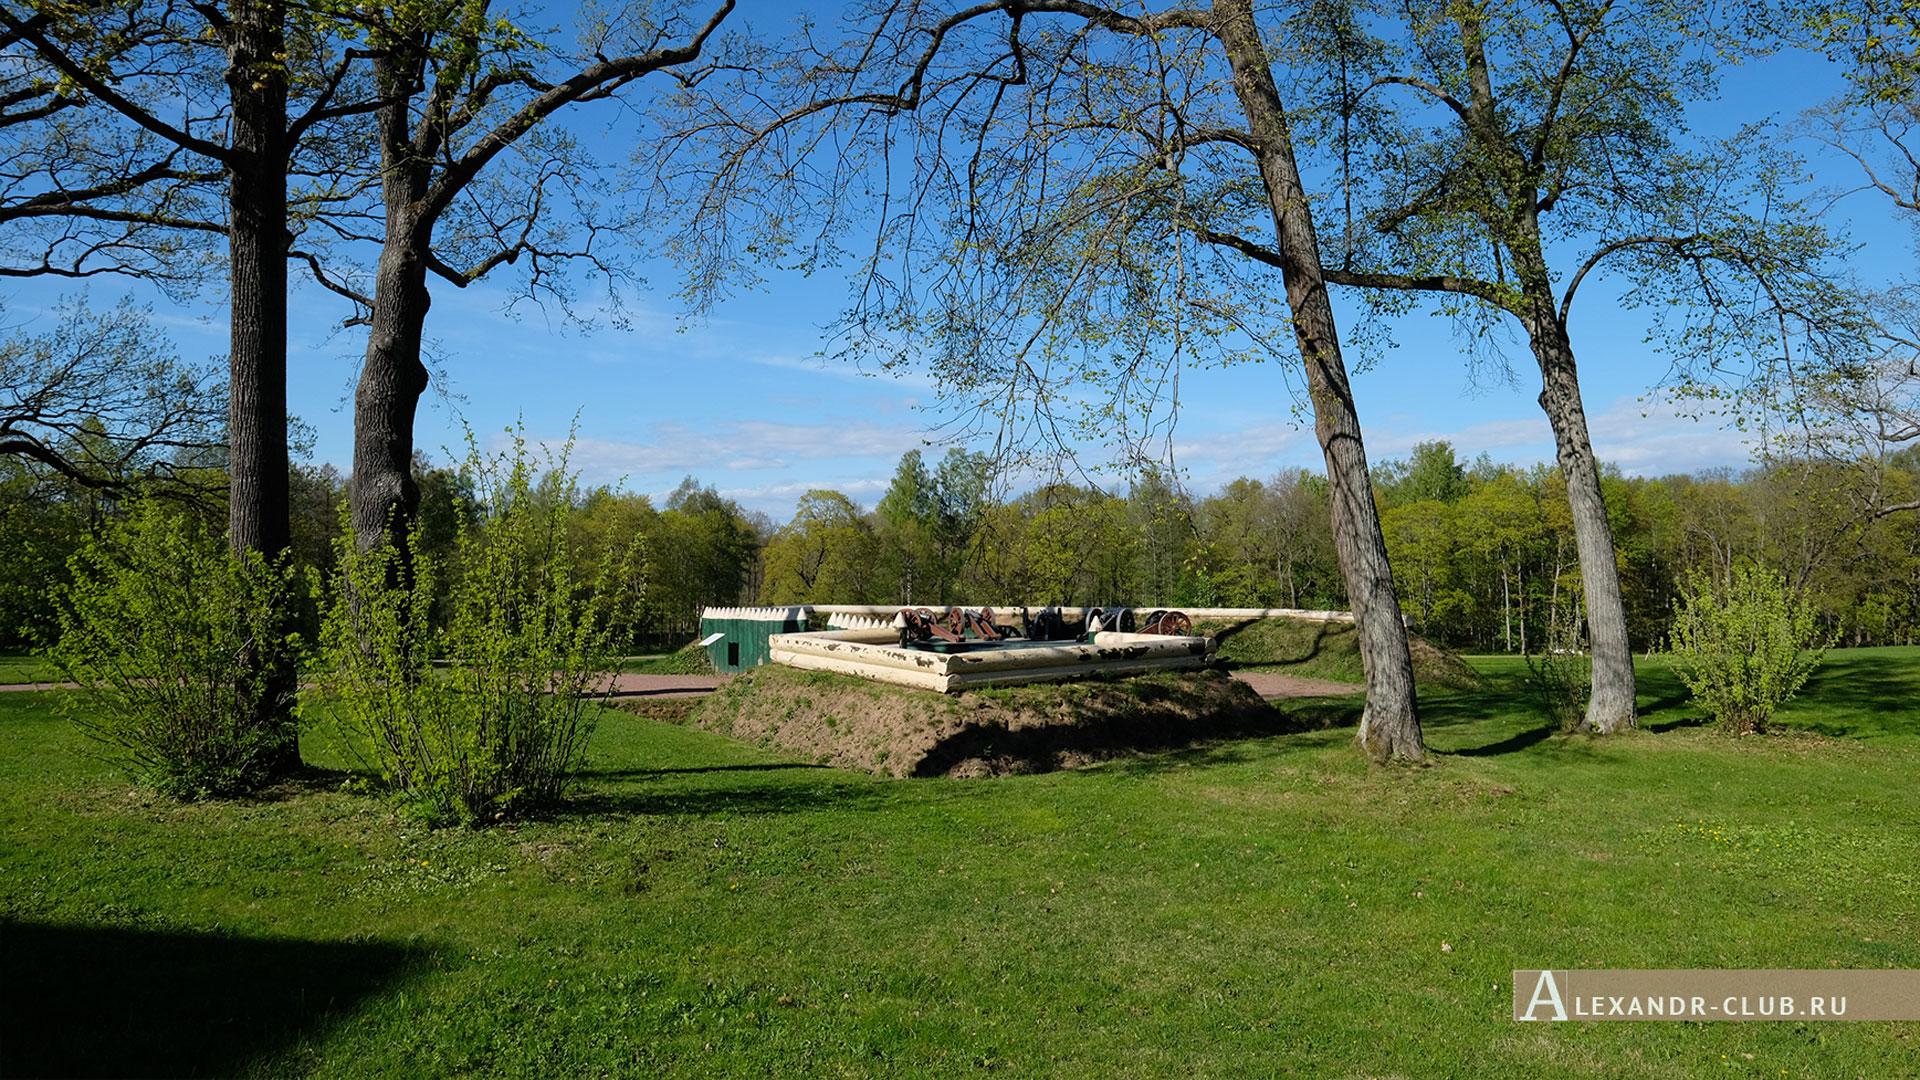 Петергоф, парк «Александрия», весна, редут